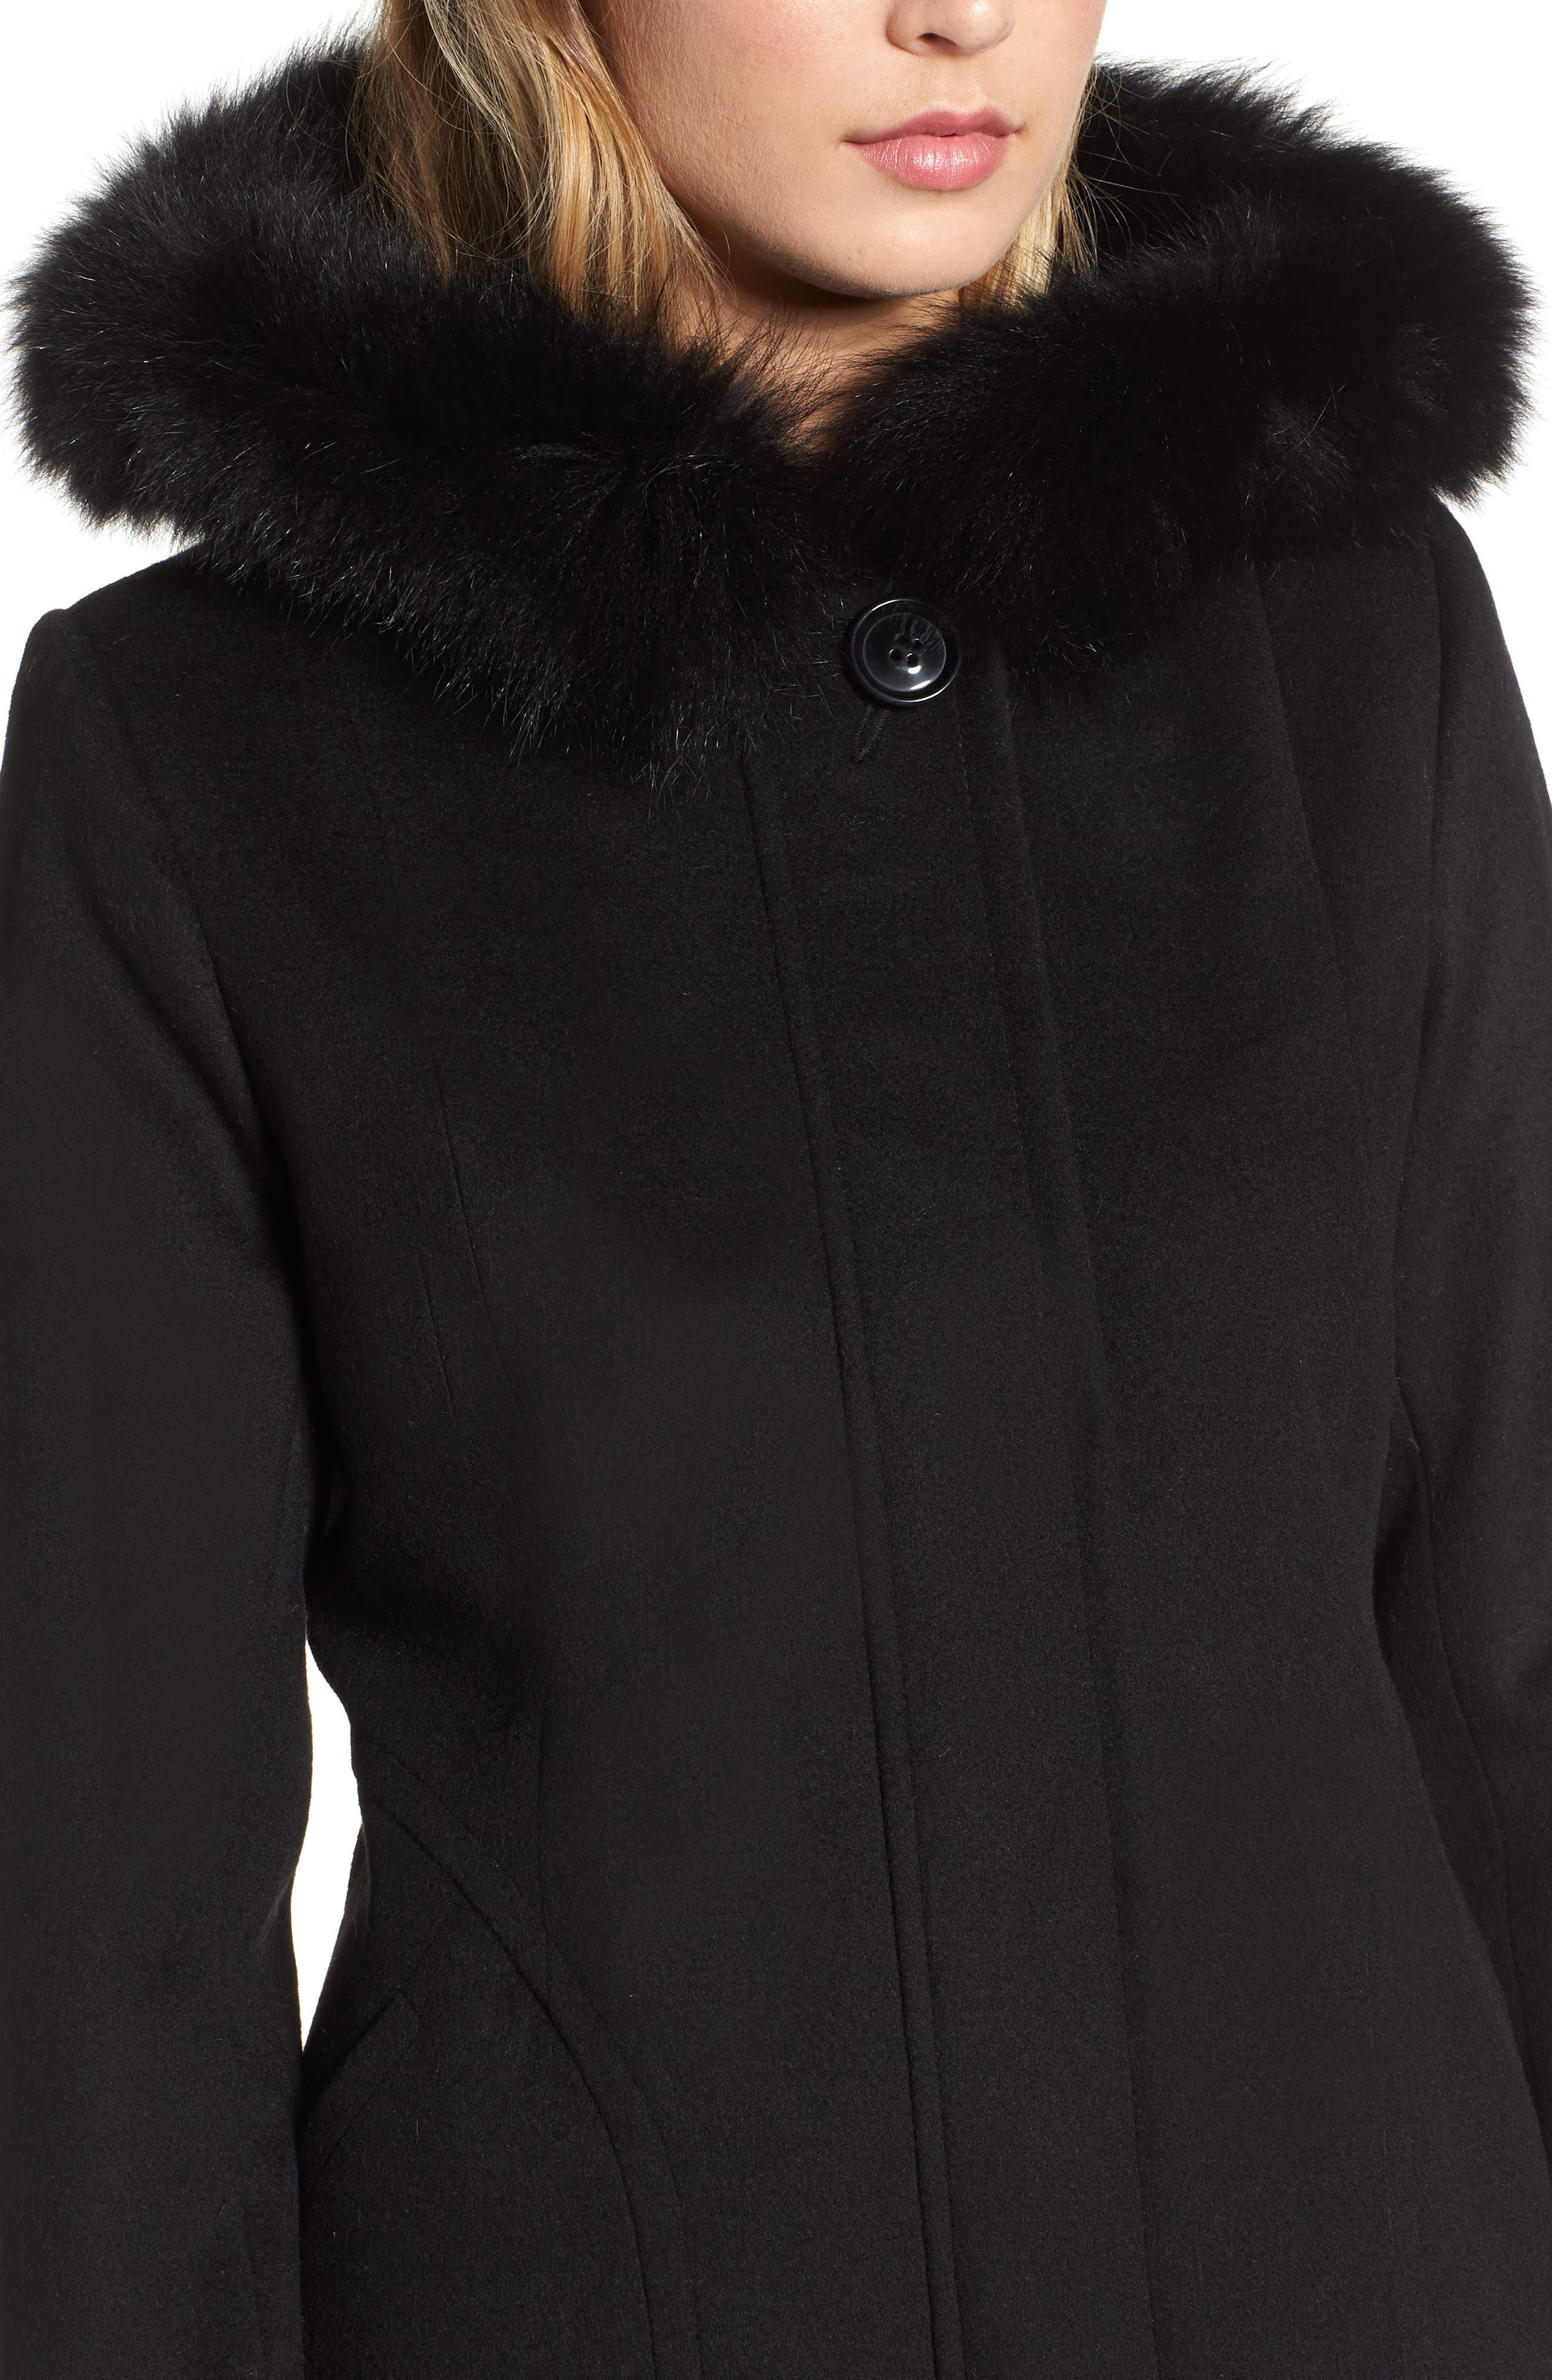 Genuine Fox Fur Trim Hooded Wool Coat,                             Alternate thumbnail 4, color,                             001